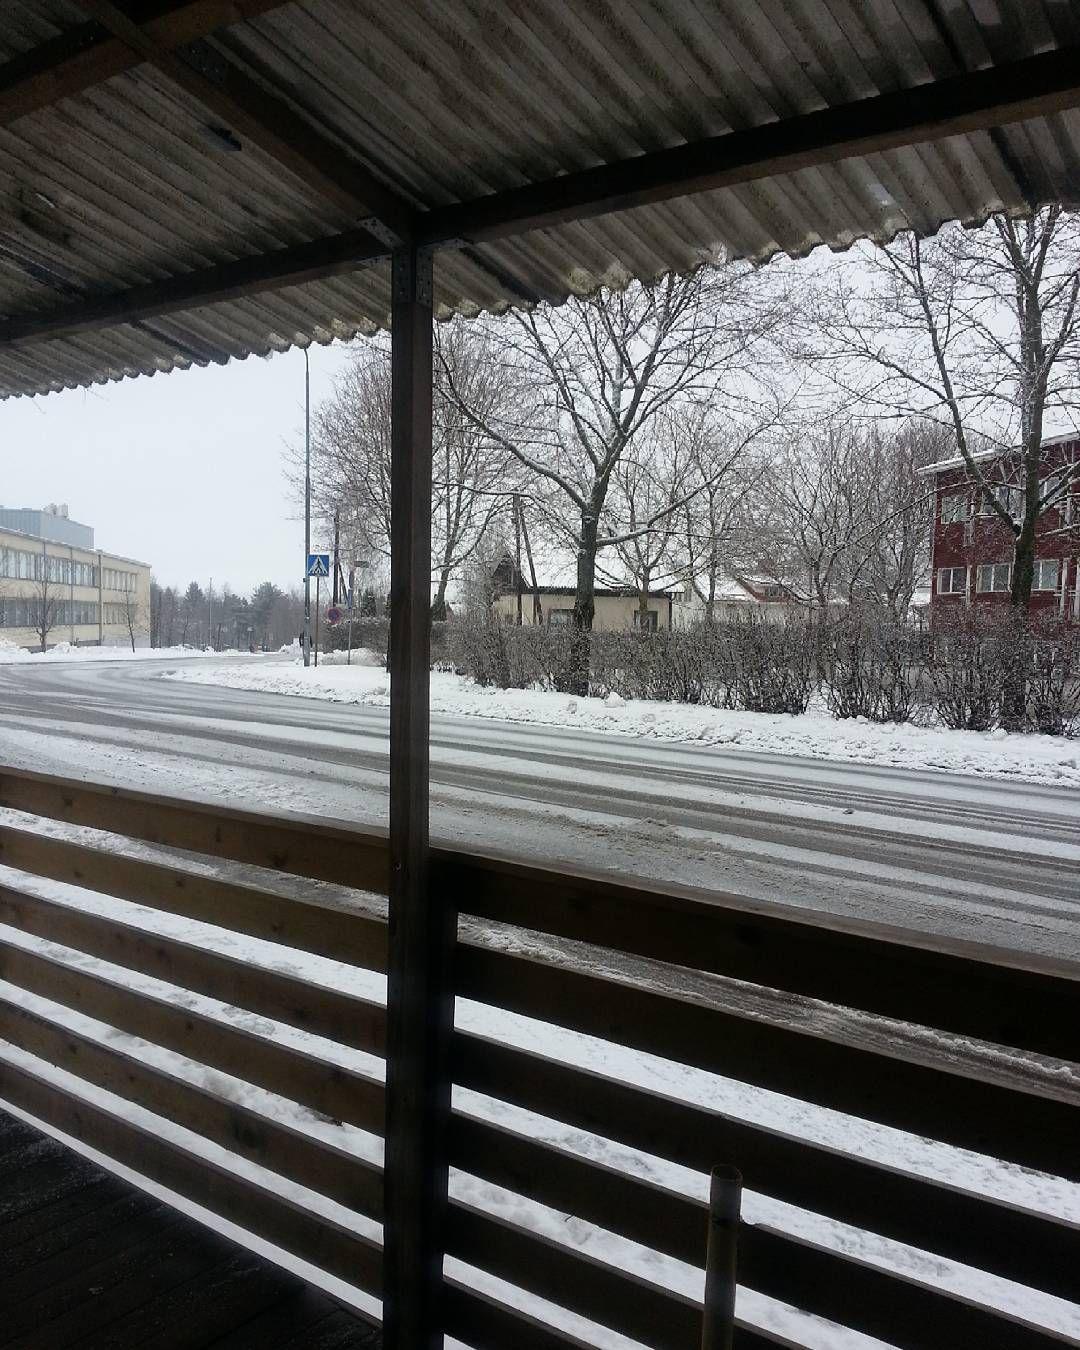 Bus stop  ขนรถปายนตลอดๆ #버스정류장 #버스 #busstop #winter #studyabroad #onceinalifetime #겨울 #버스기다리는중 by pekiezaa